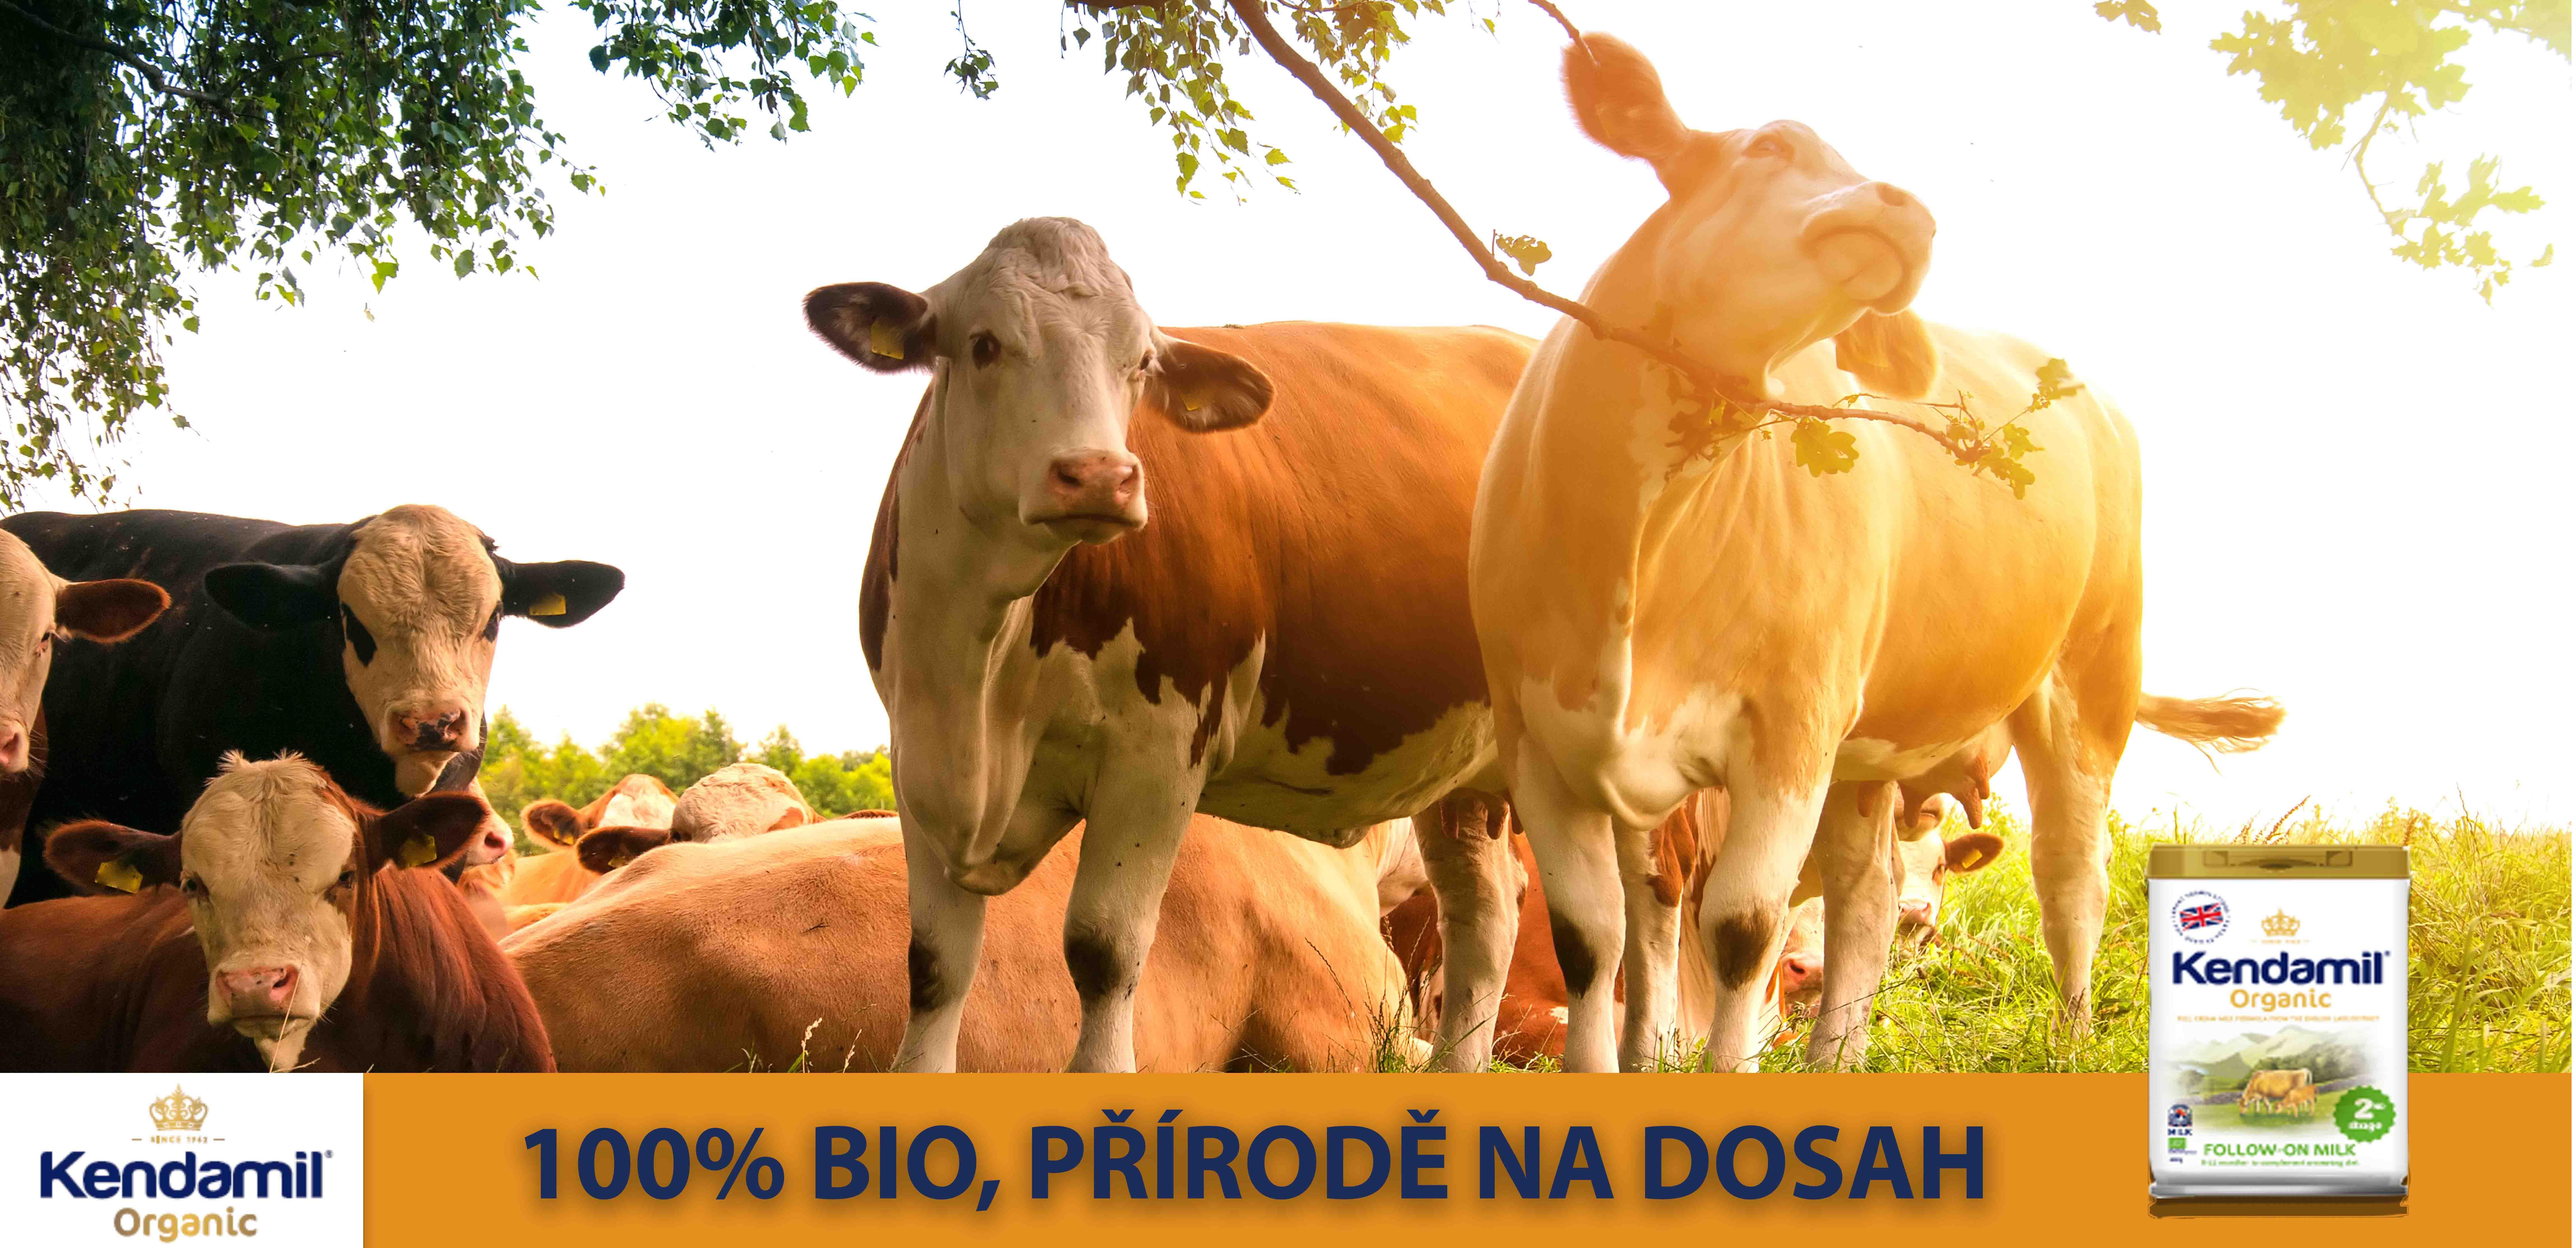 Kendamil Organická mléka